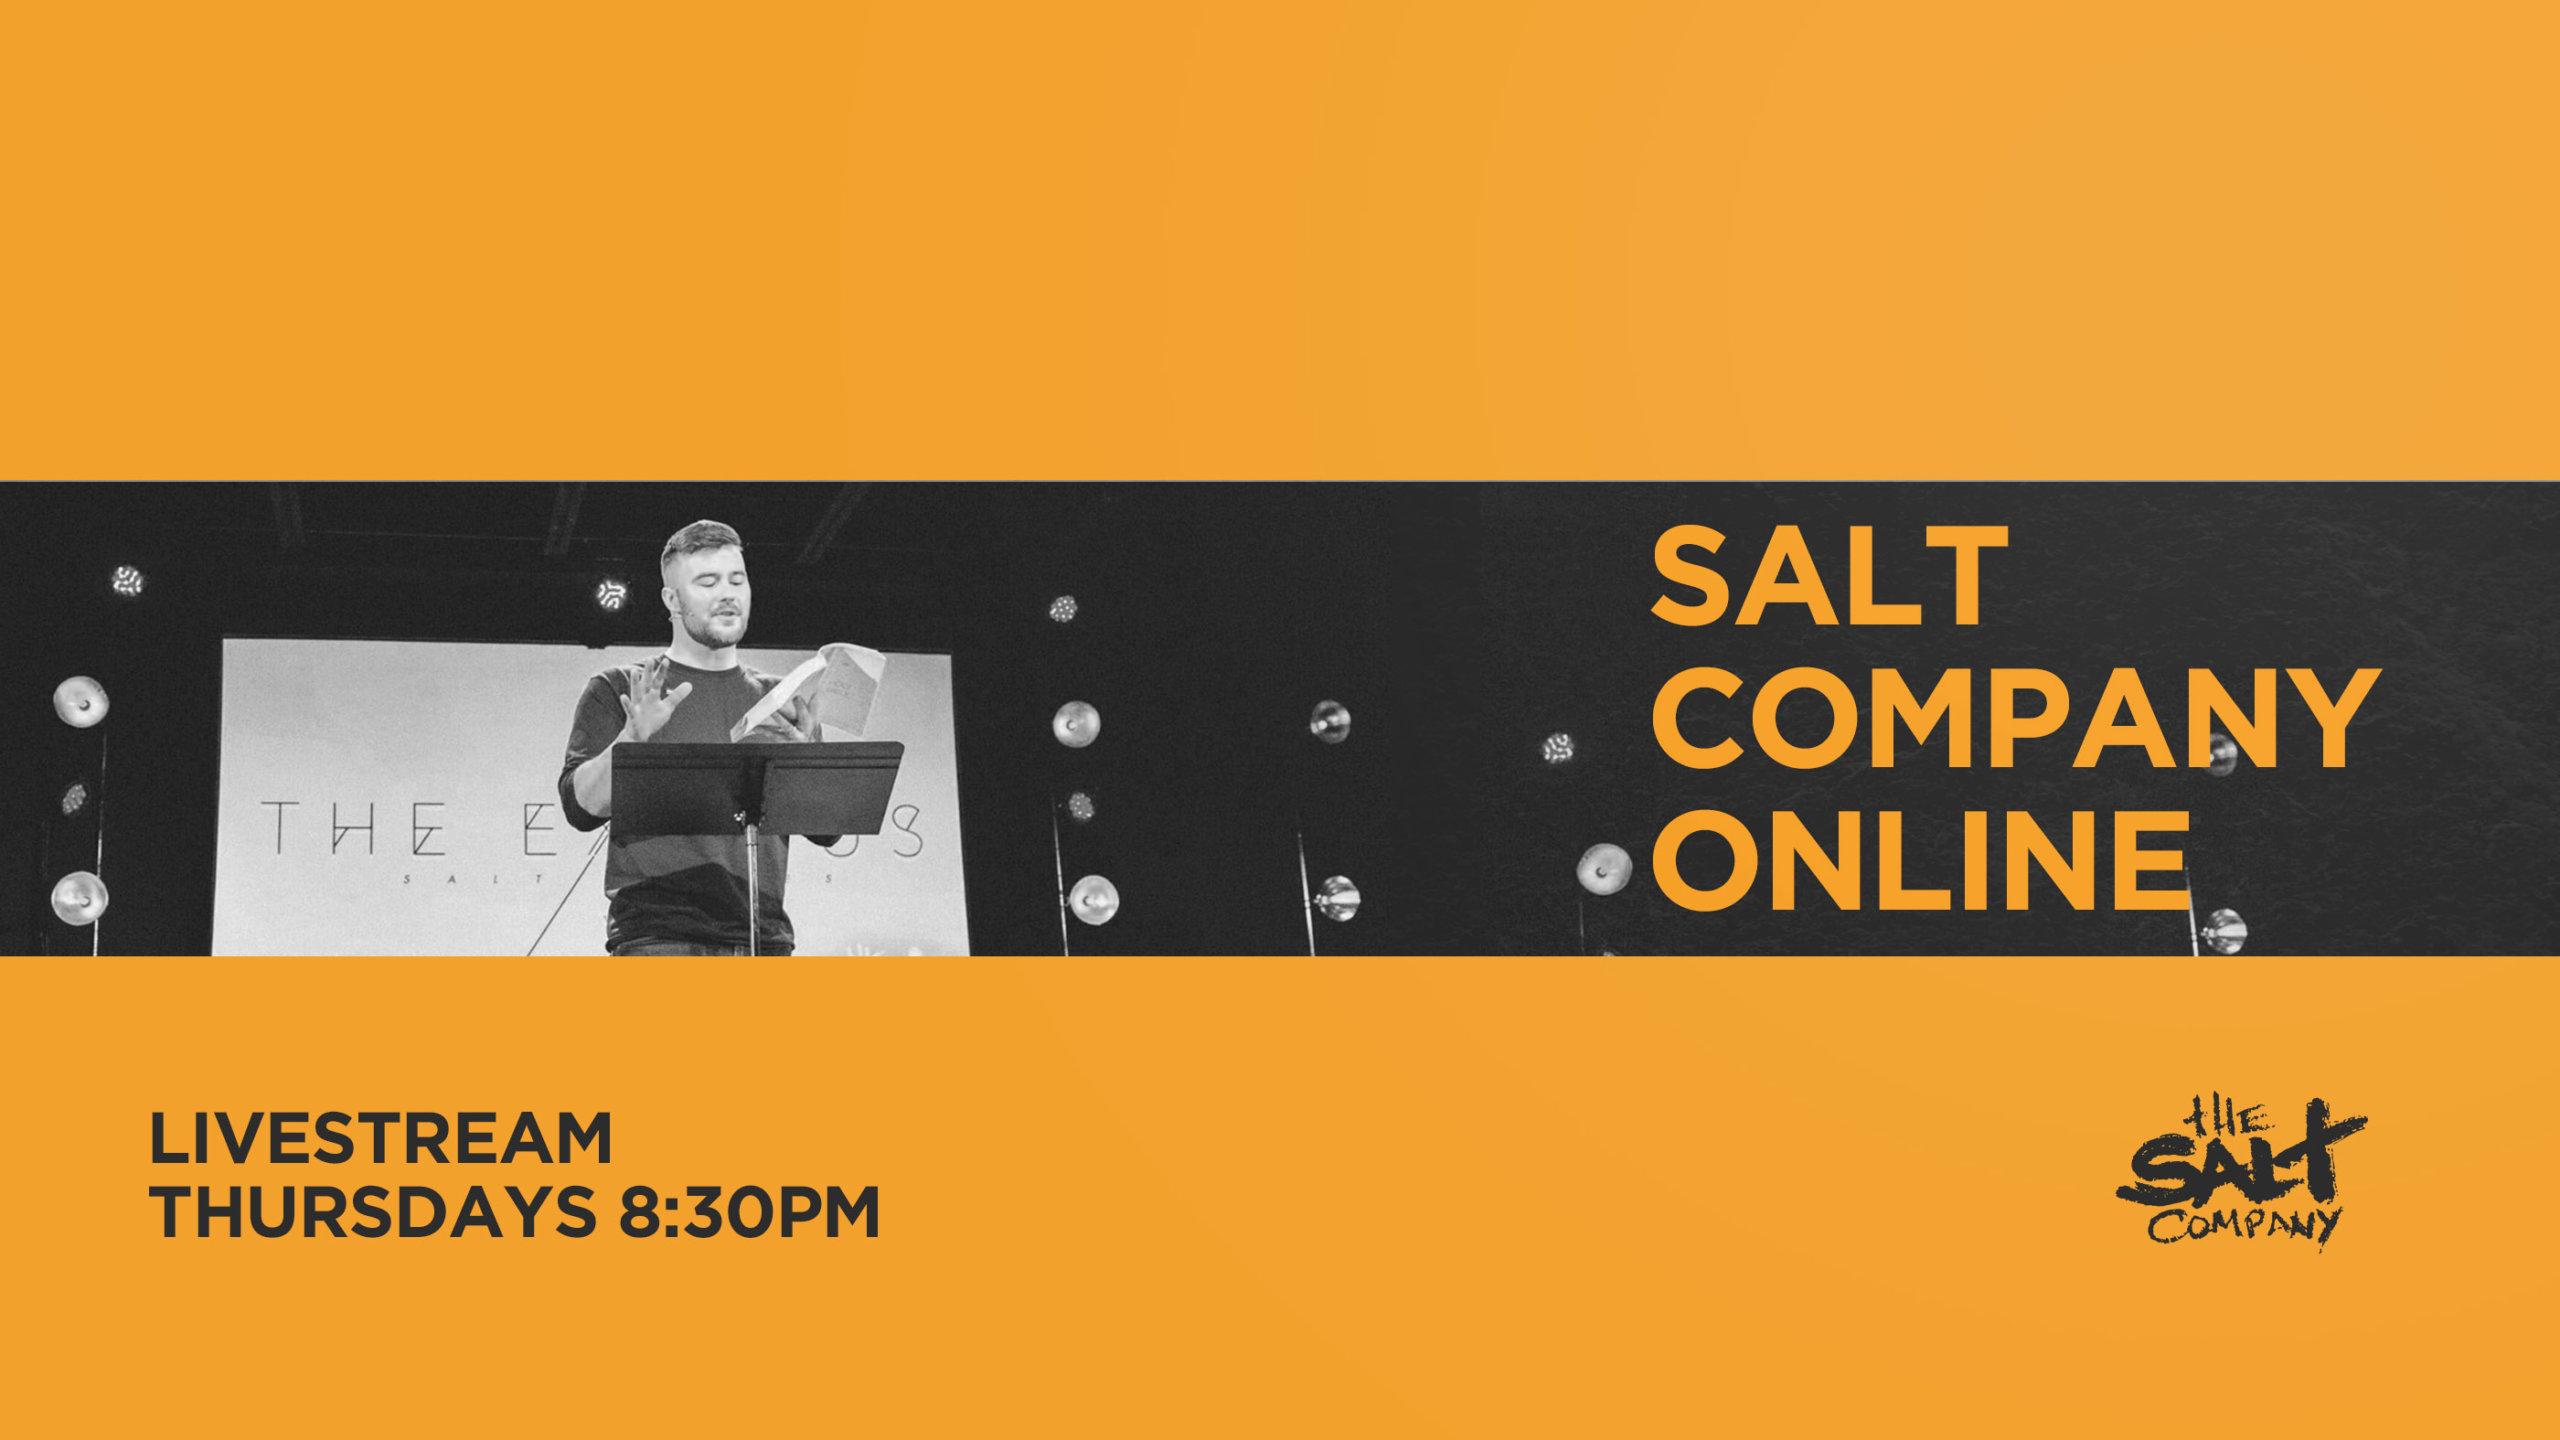 salt online - 830p